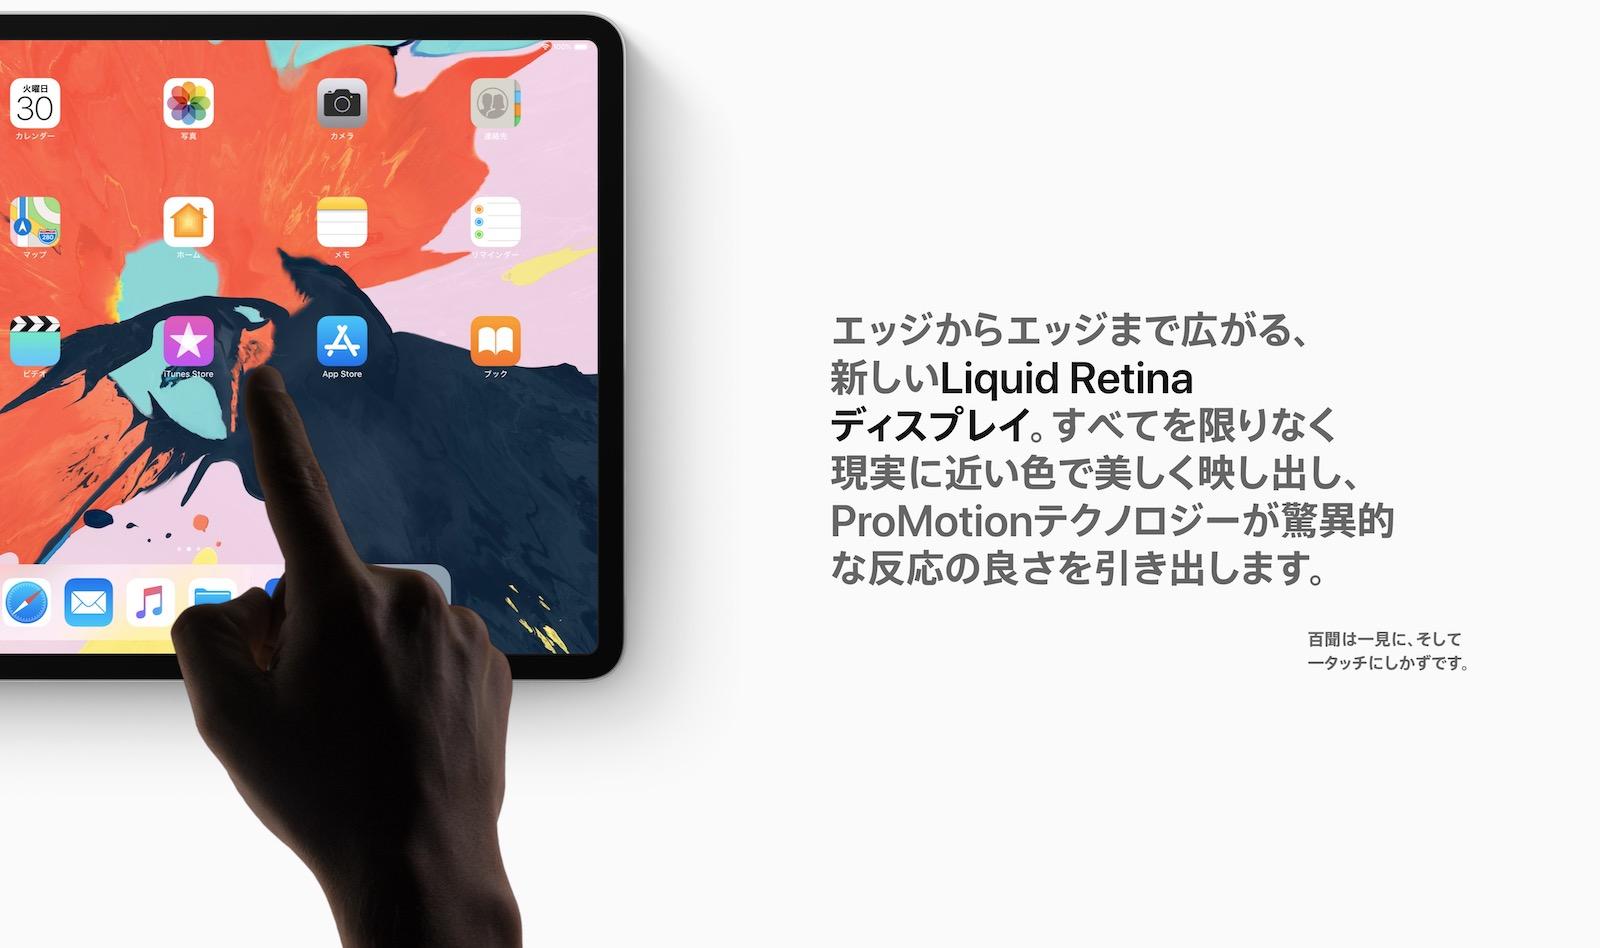 Liquid-Retina-Display-ipad-pro.jpg